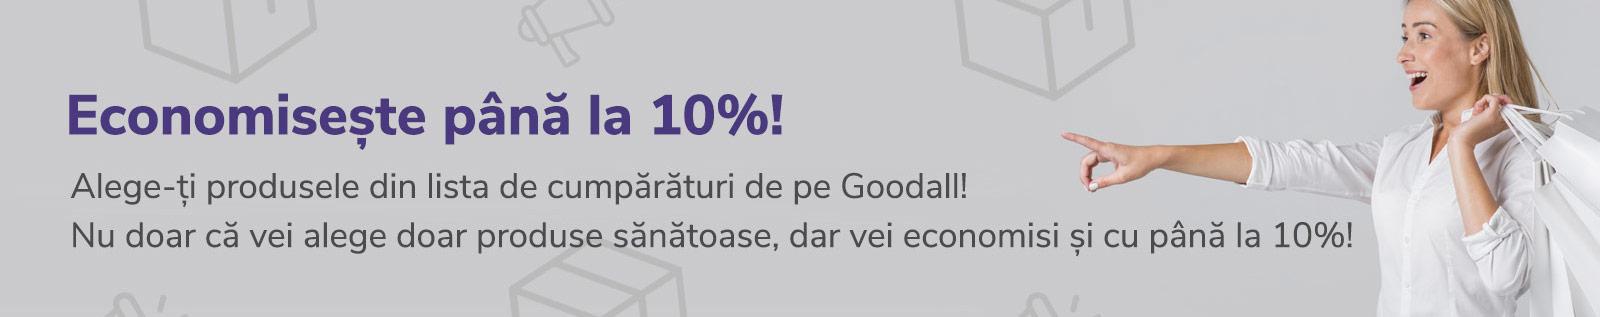 Economiseste pana la 10%